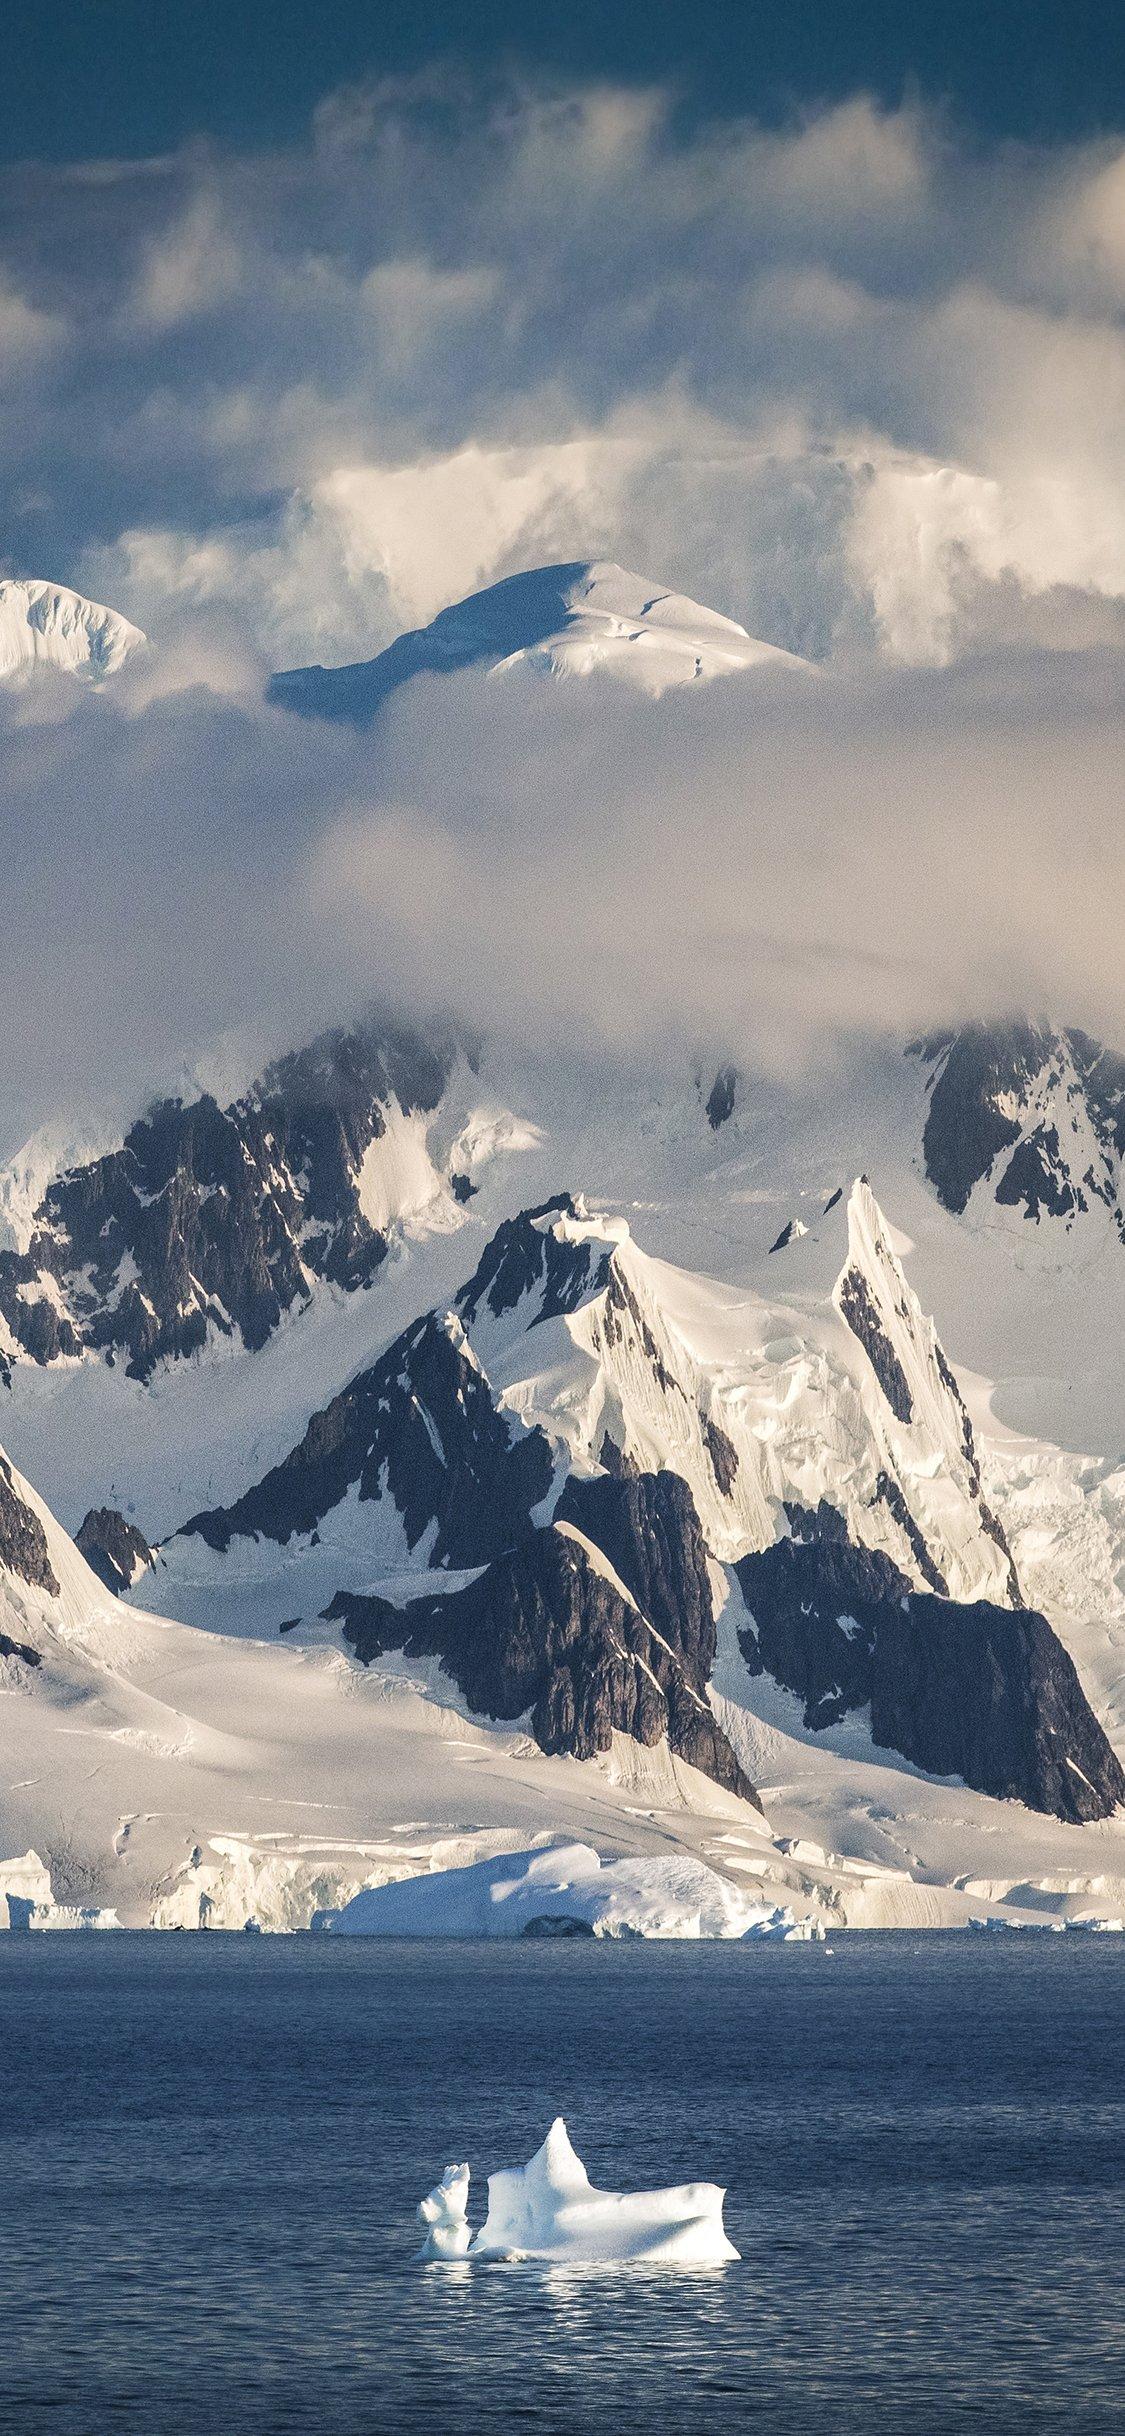 Wallpaper   Epic Antarctica   Paul Zizka Photography 1125x2436